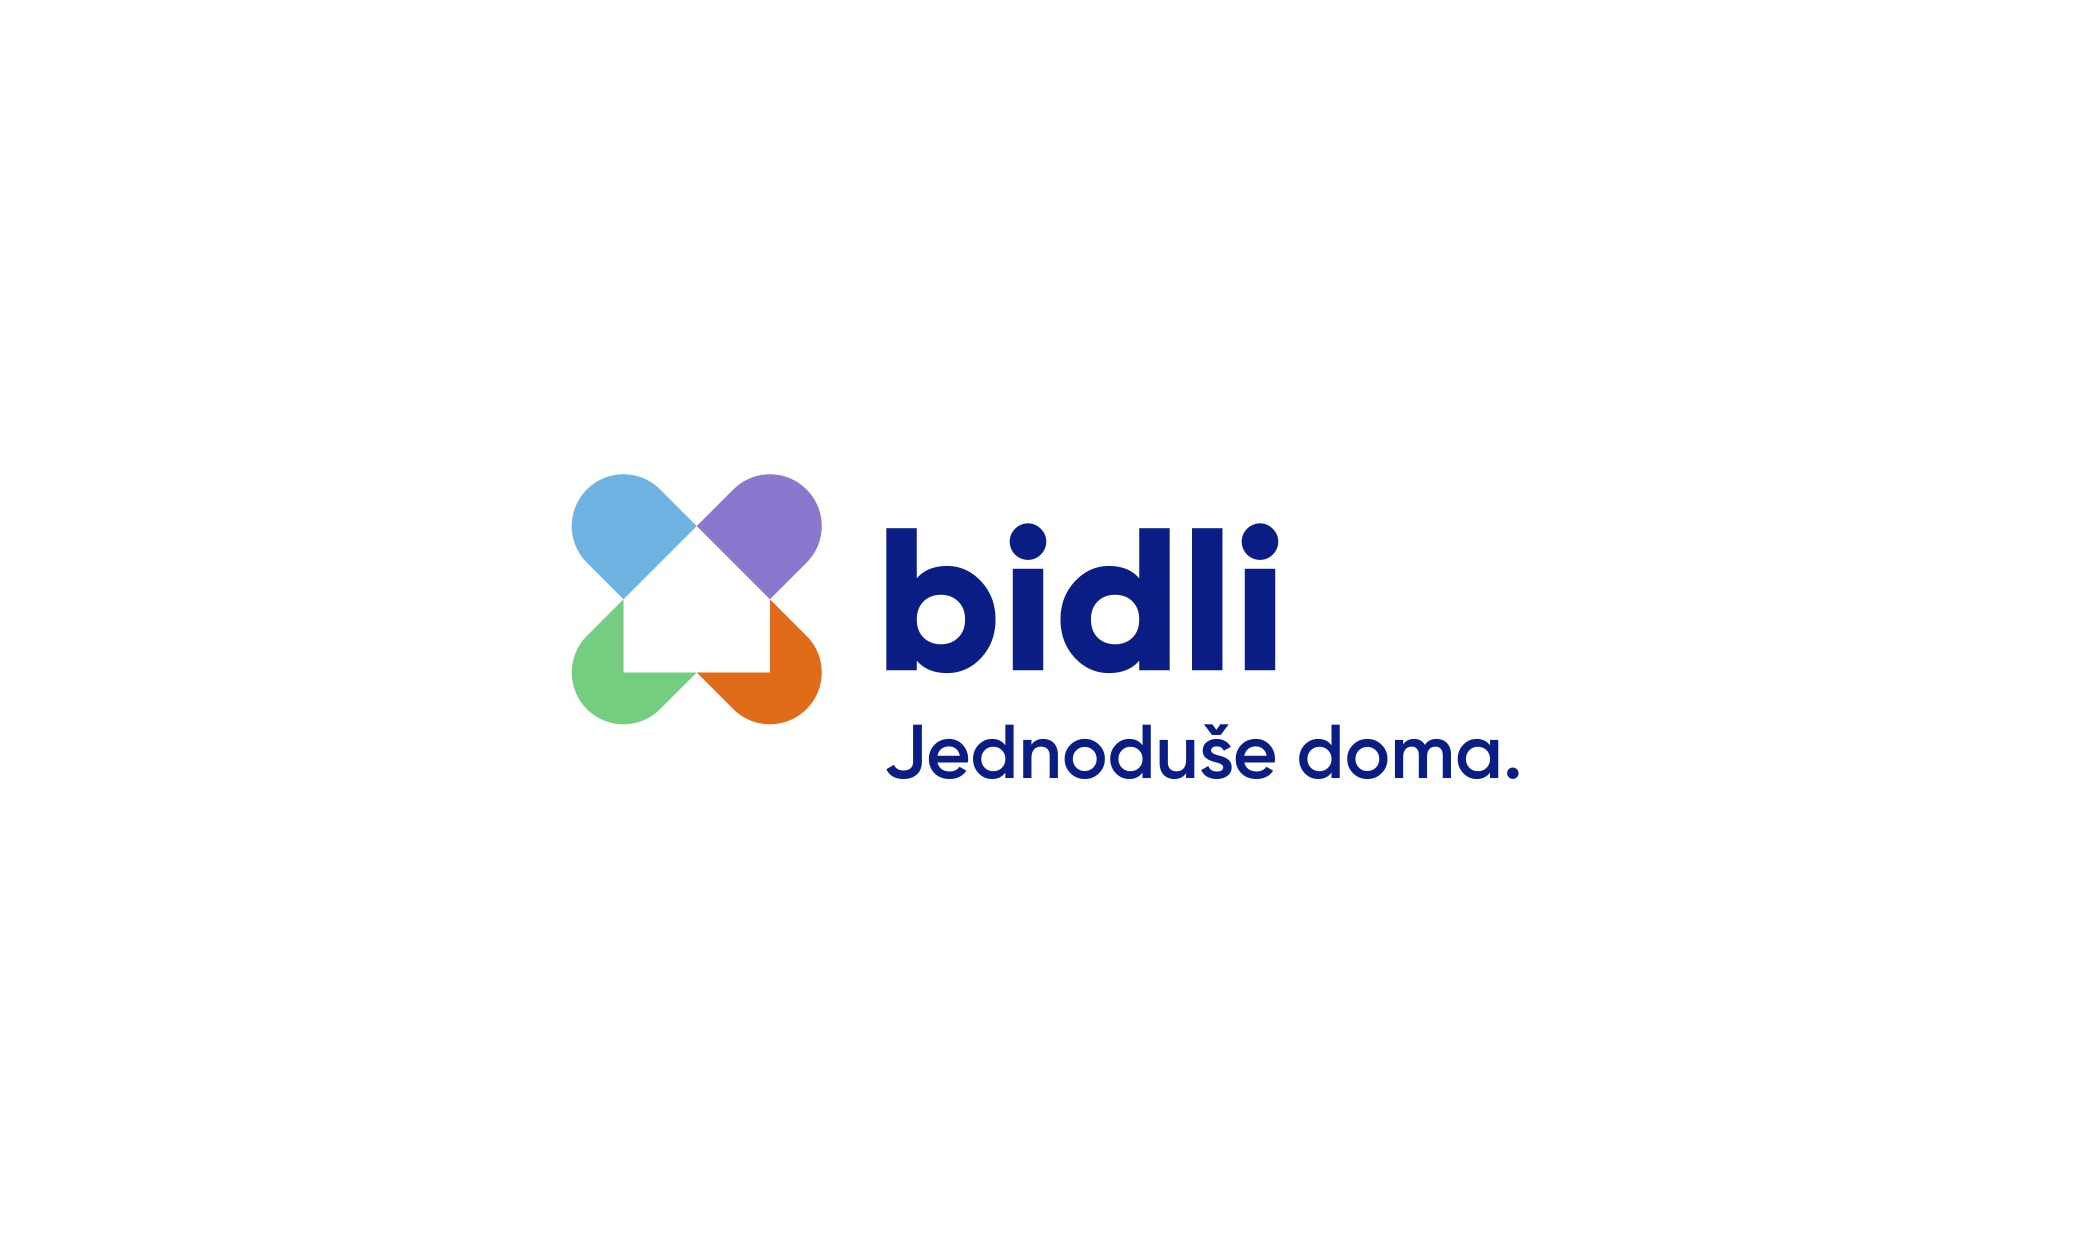 bidli_logo_RGB.jpg